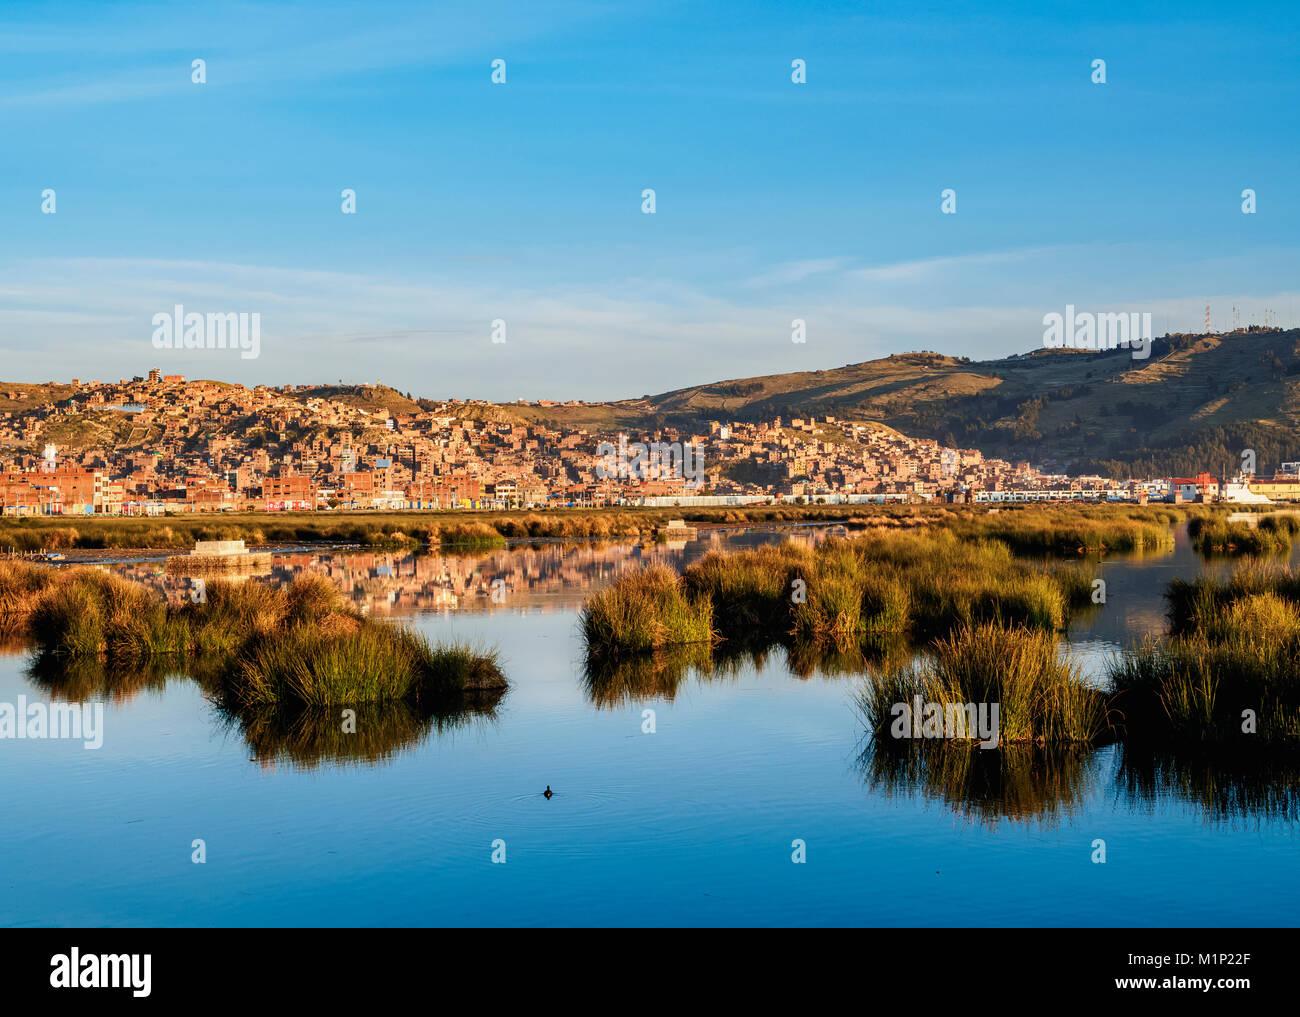 Lake Titicaca and cityscape of Puno at sunrise, Peru, South America - Stock Image